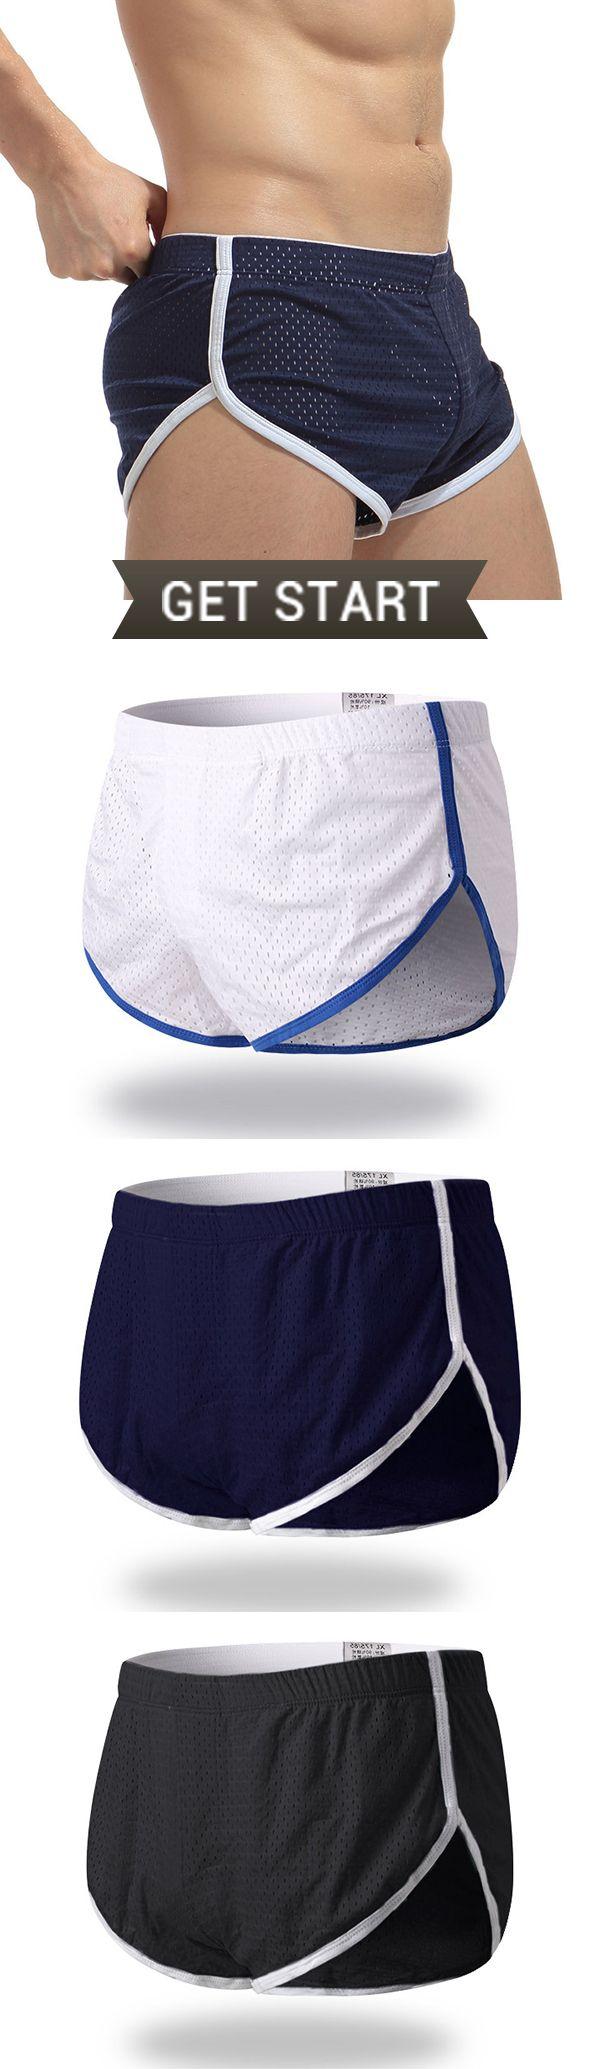 Breathable Mesh Side Splited Underwear /Arrow Pants /Inside Pouch Sleepwear #mensfashion #outfit #fashion